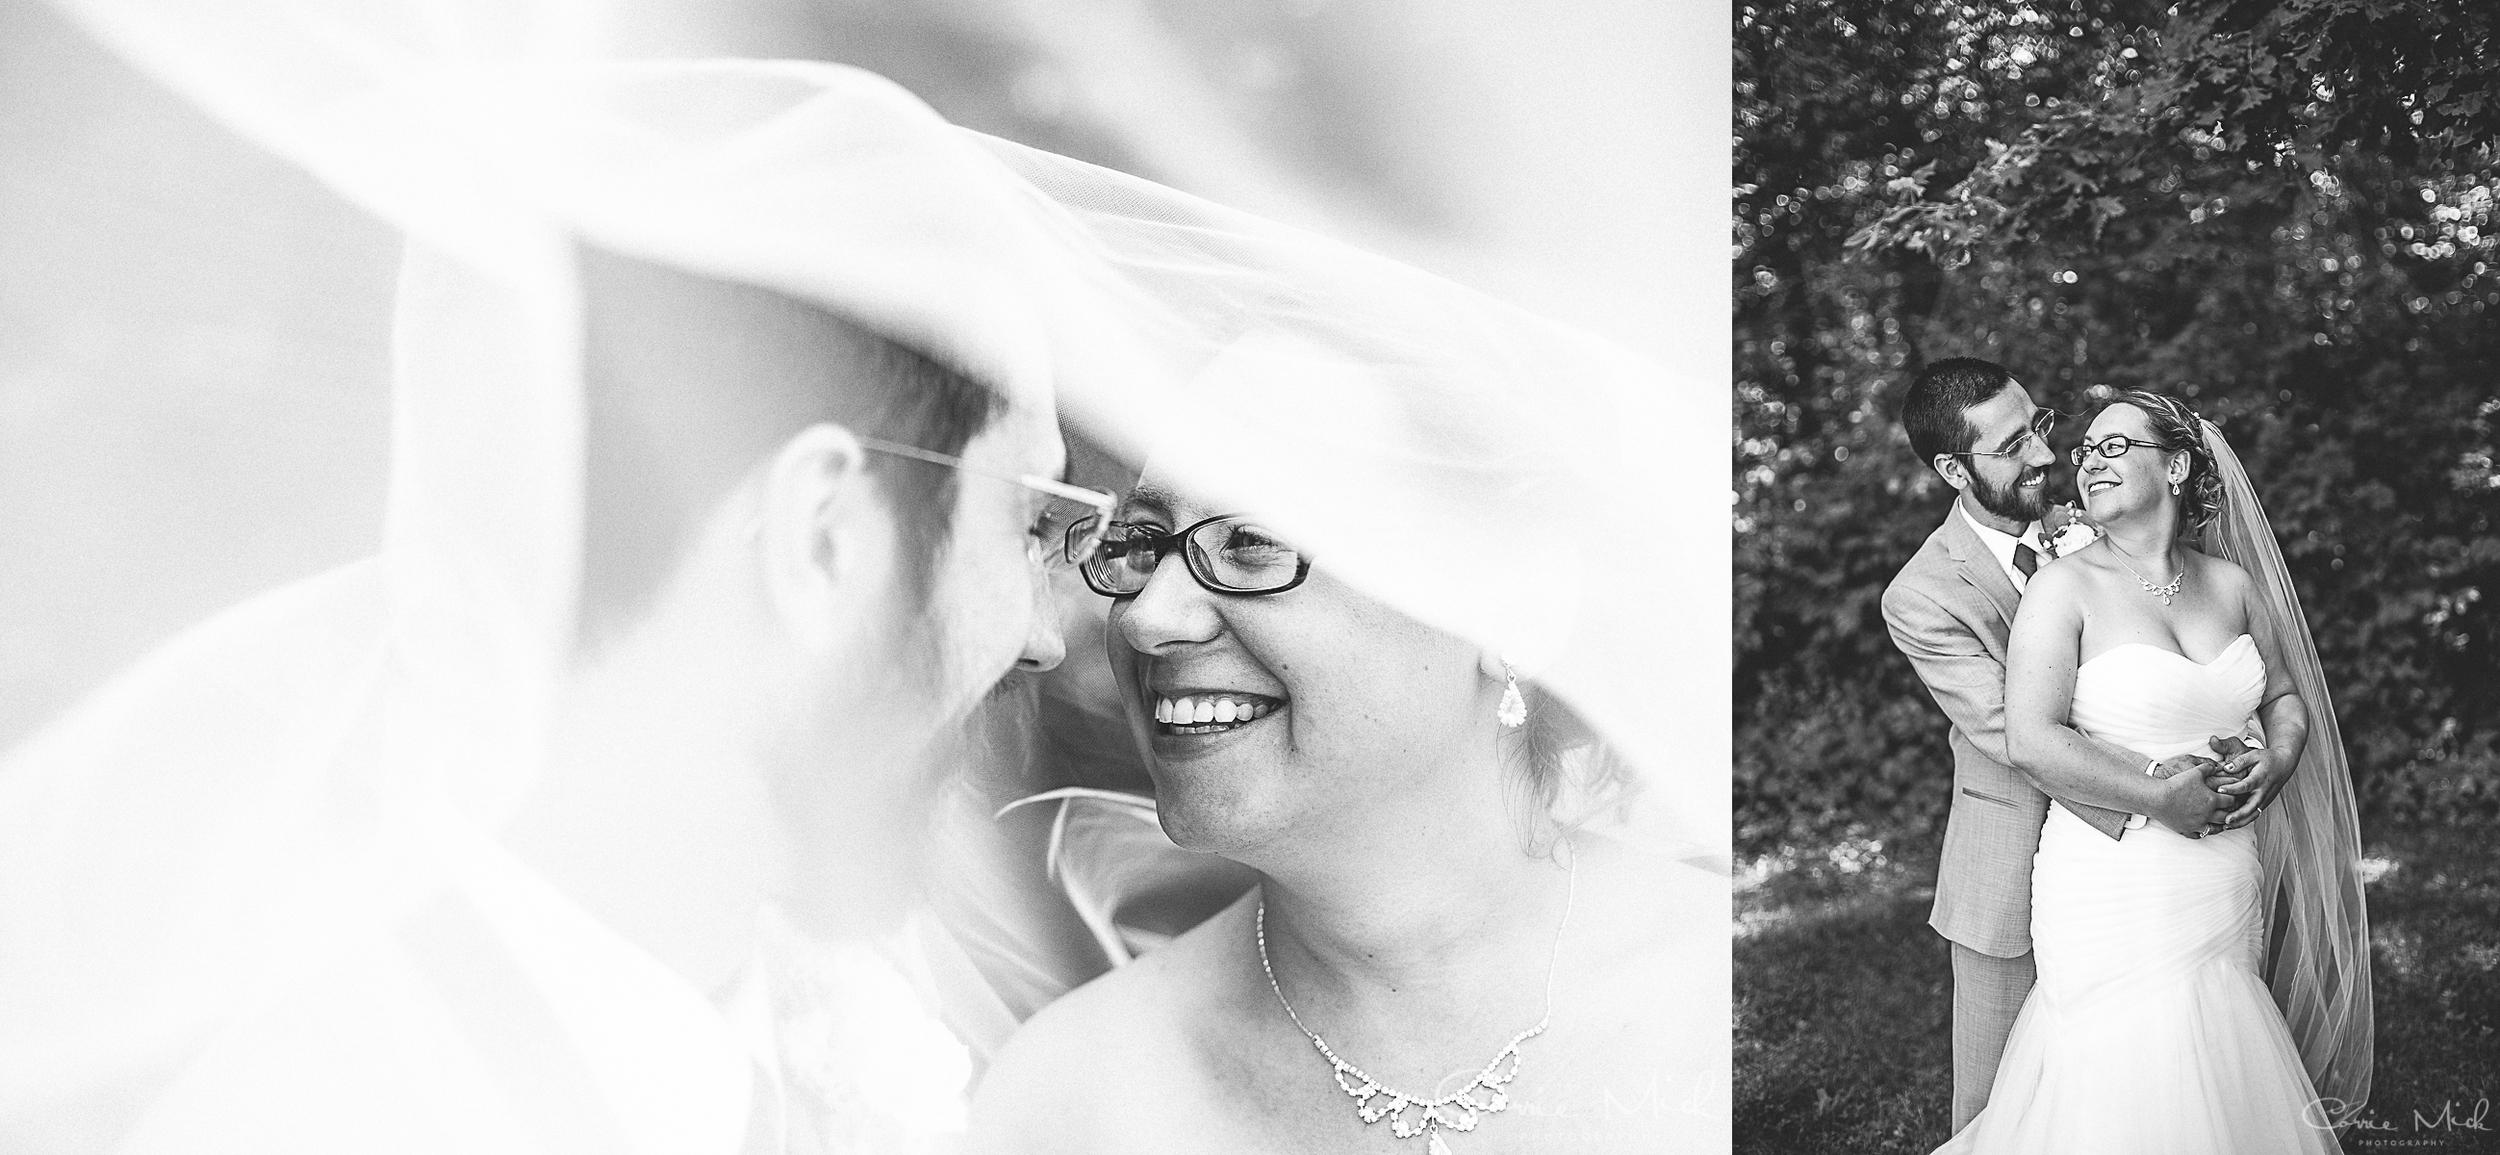 Peter & Rachel Black & White - Corrie Mick Photography.jpg